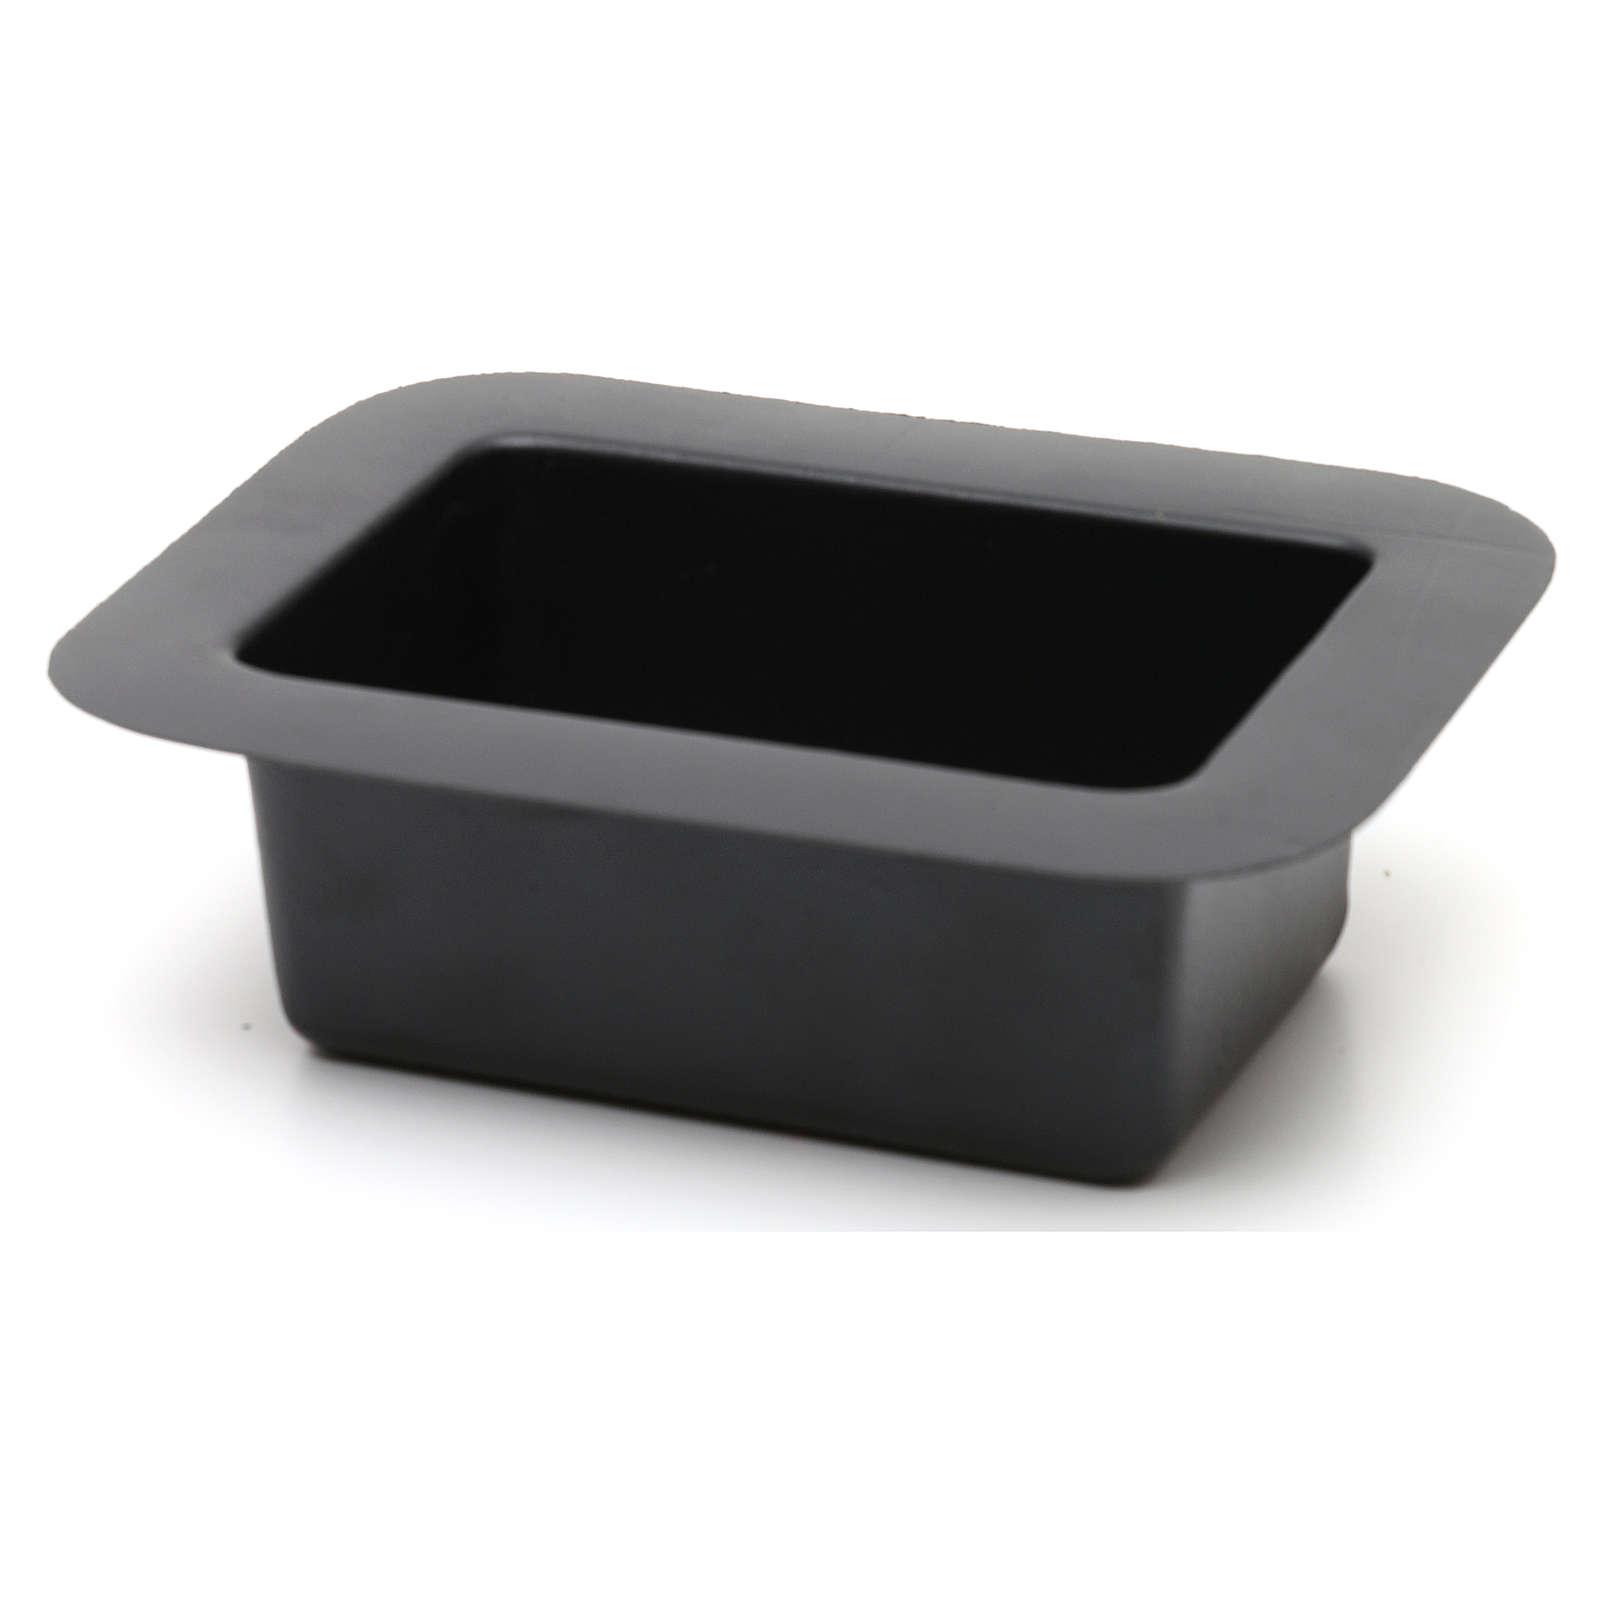 Black basin for fountain 5x15x10 cm 4